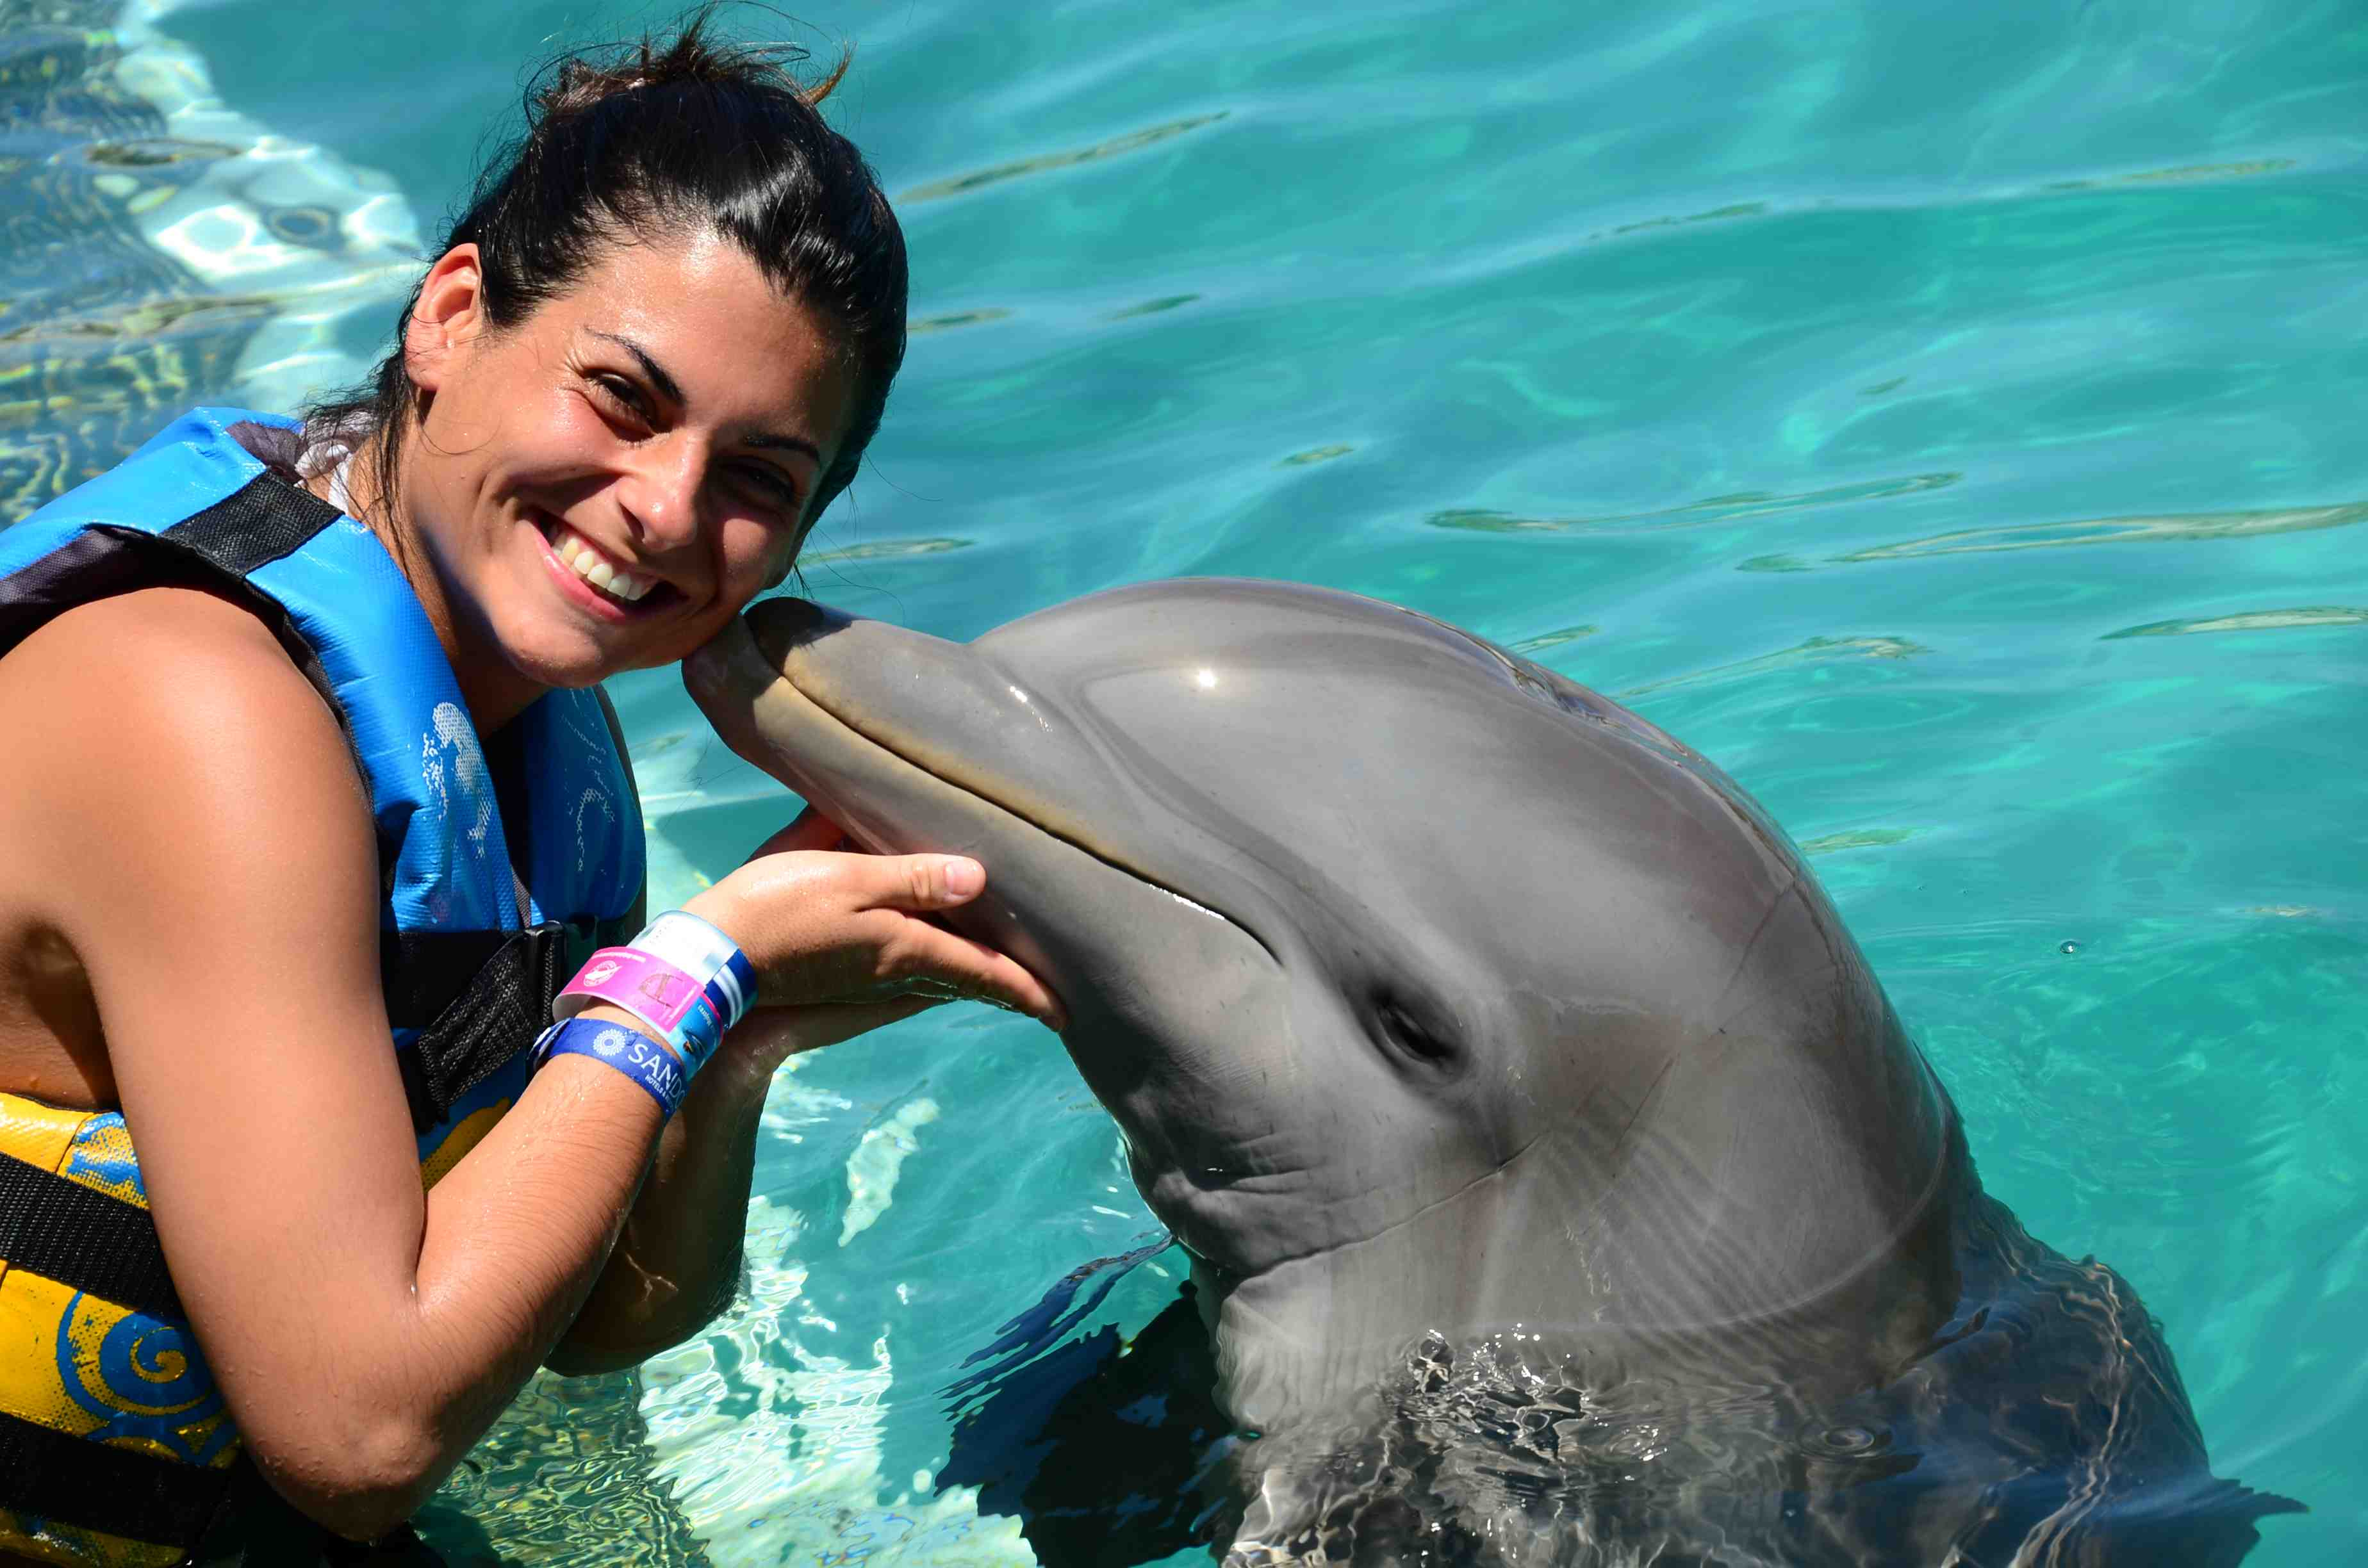 Dolphin Royal Swim - Last Minute Tours in Puerto Vallarta